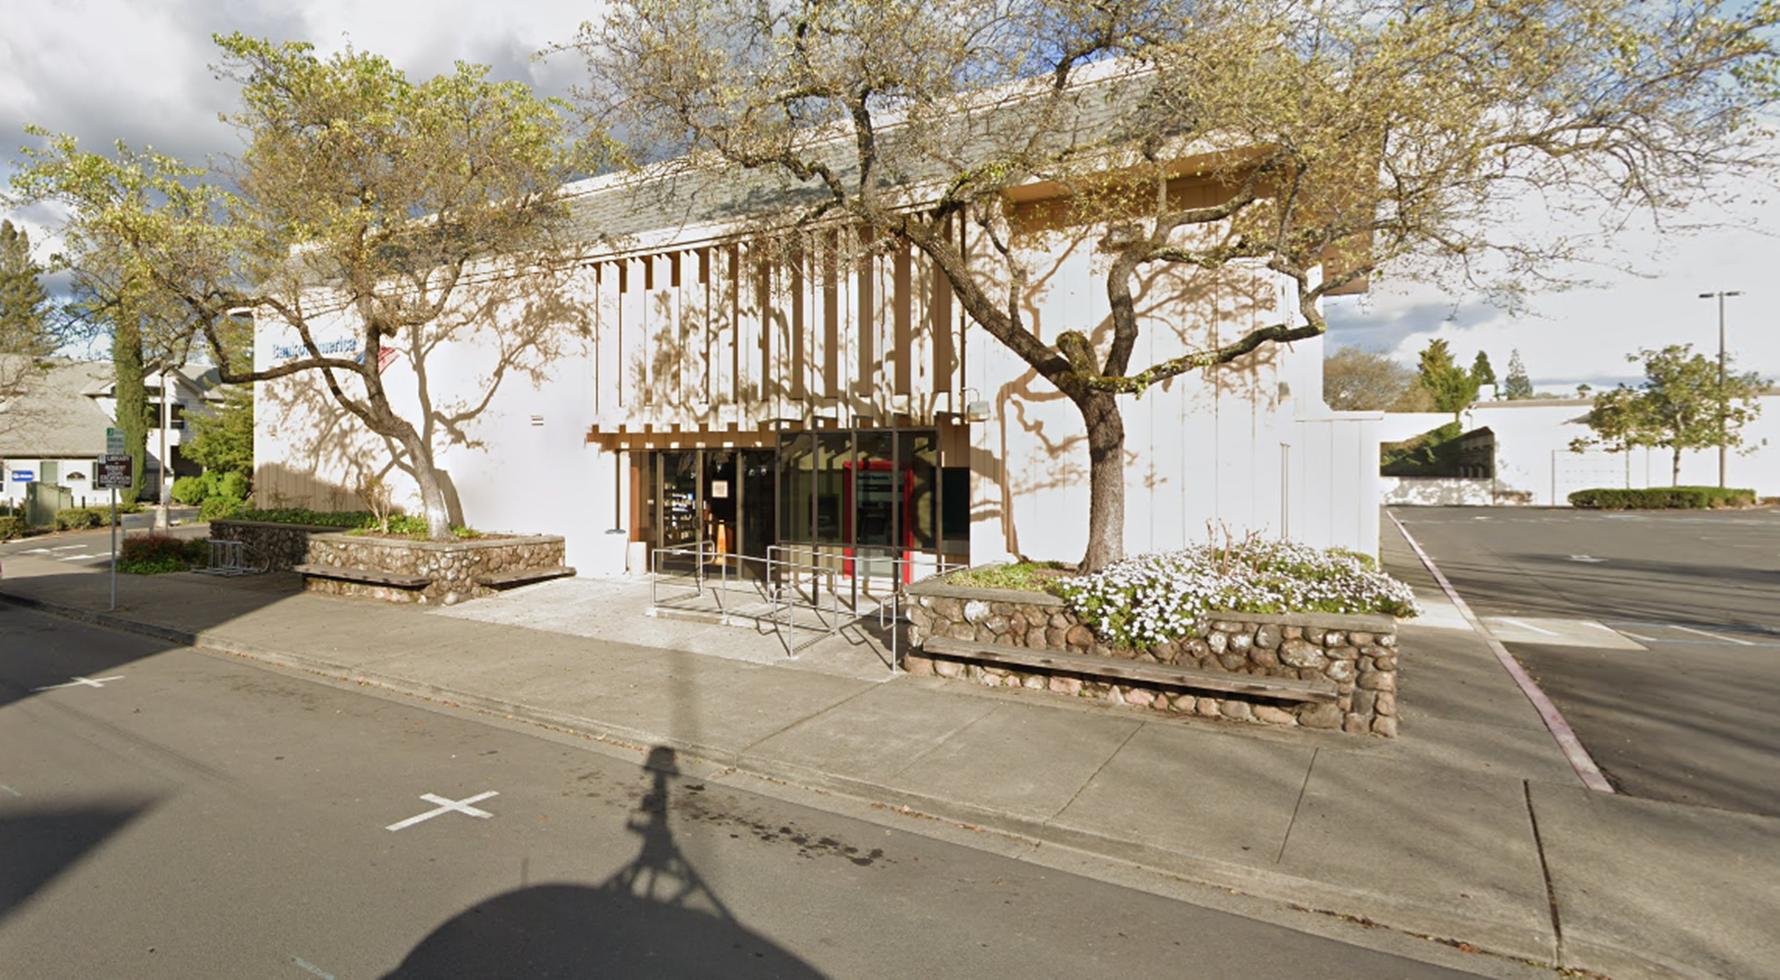 Bank of America financial center with drive-thru ATM   1001 Adams St, Saint Helena, CA 94574